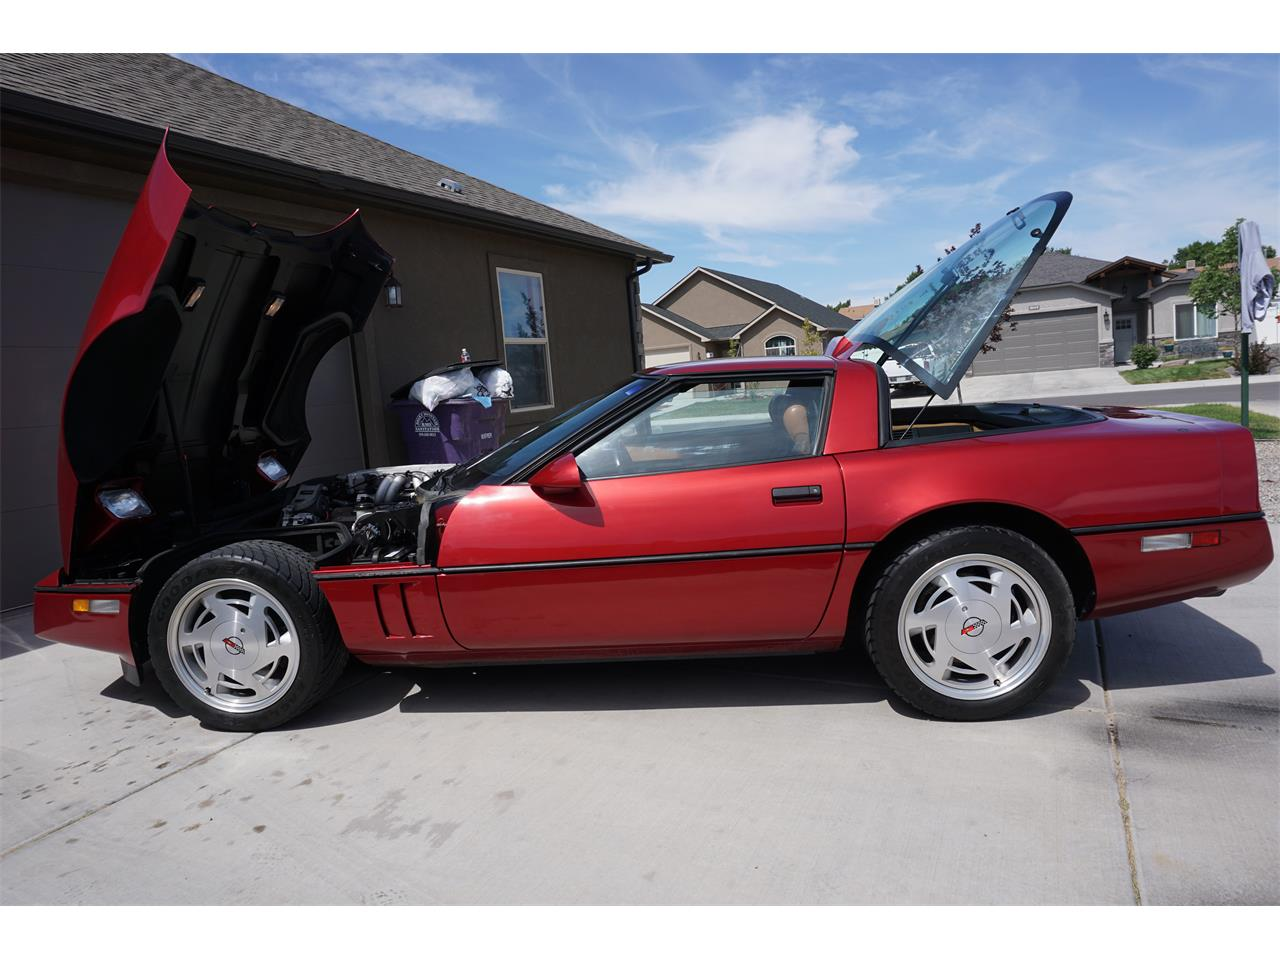 Large Picture of 1989 Corvette C4 - $9,500.00 - QTU6